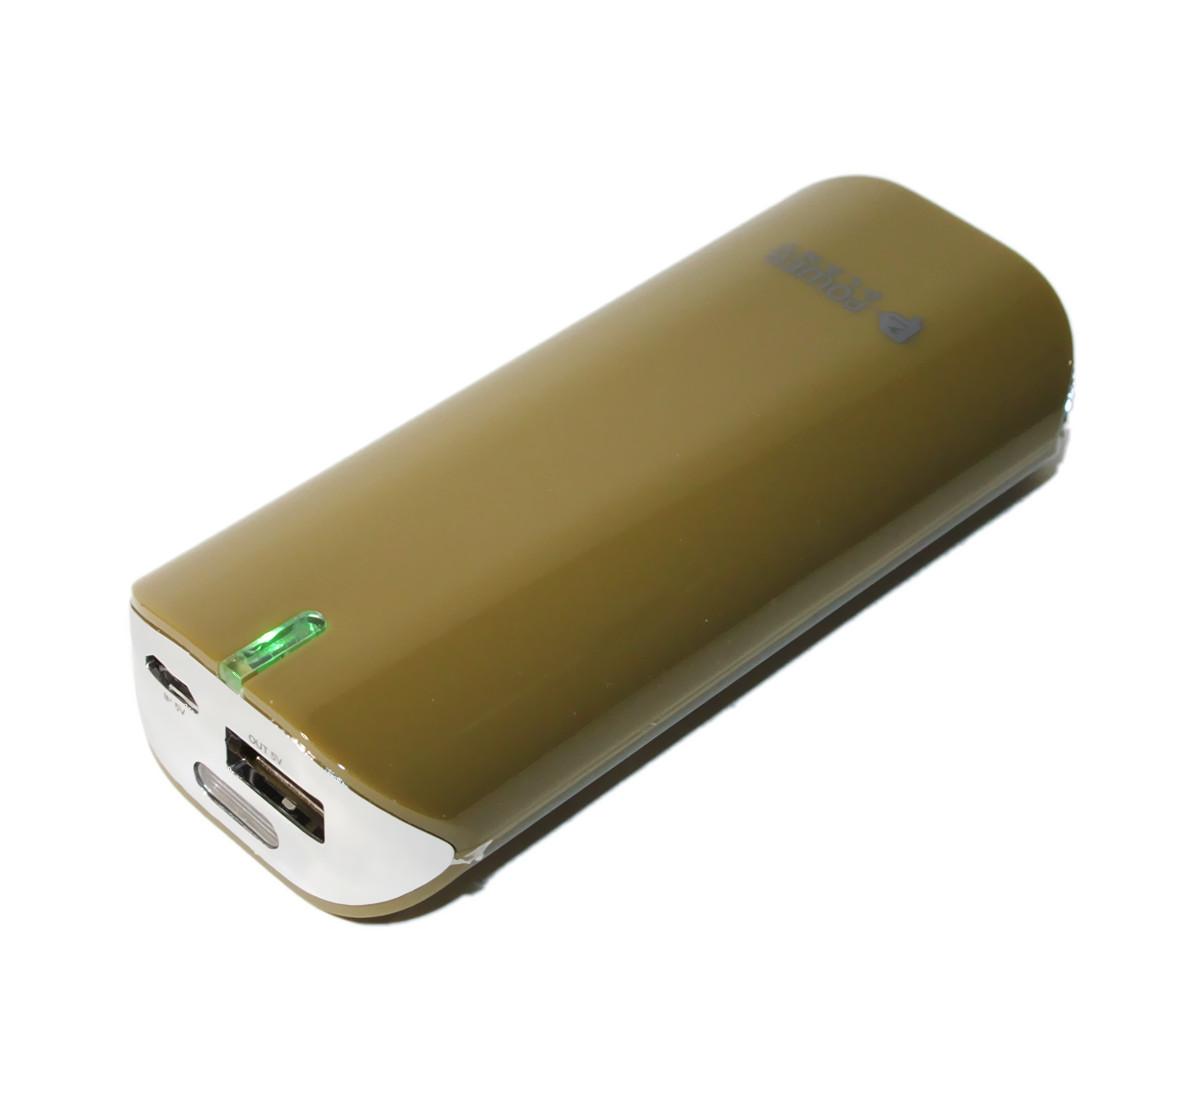 Повербанк 5200 mAh, PowerPlant, Brown (PPLA9005), power bank, портатив